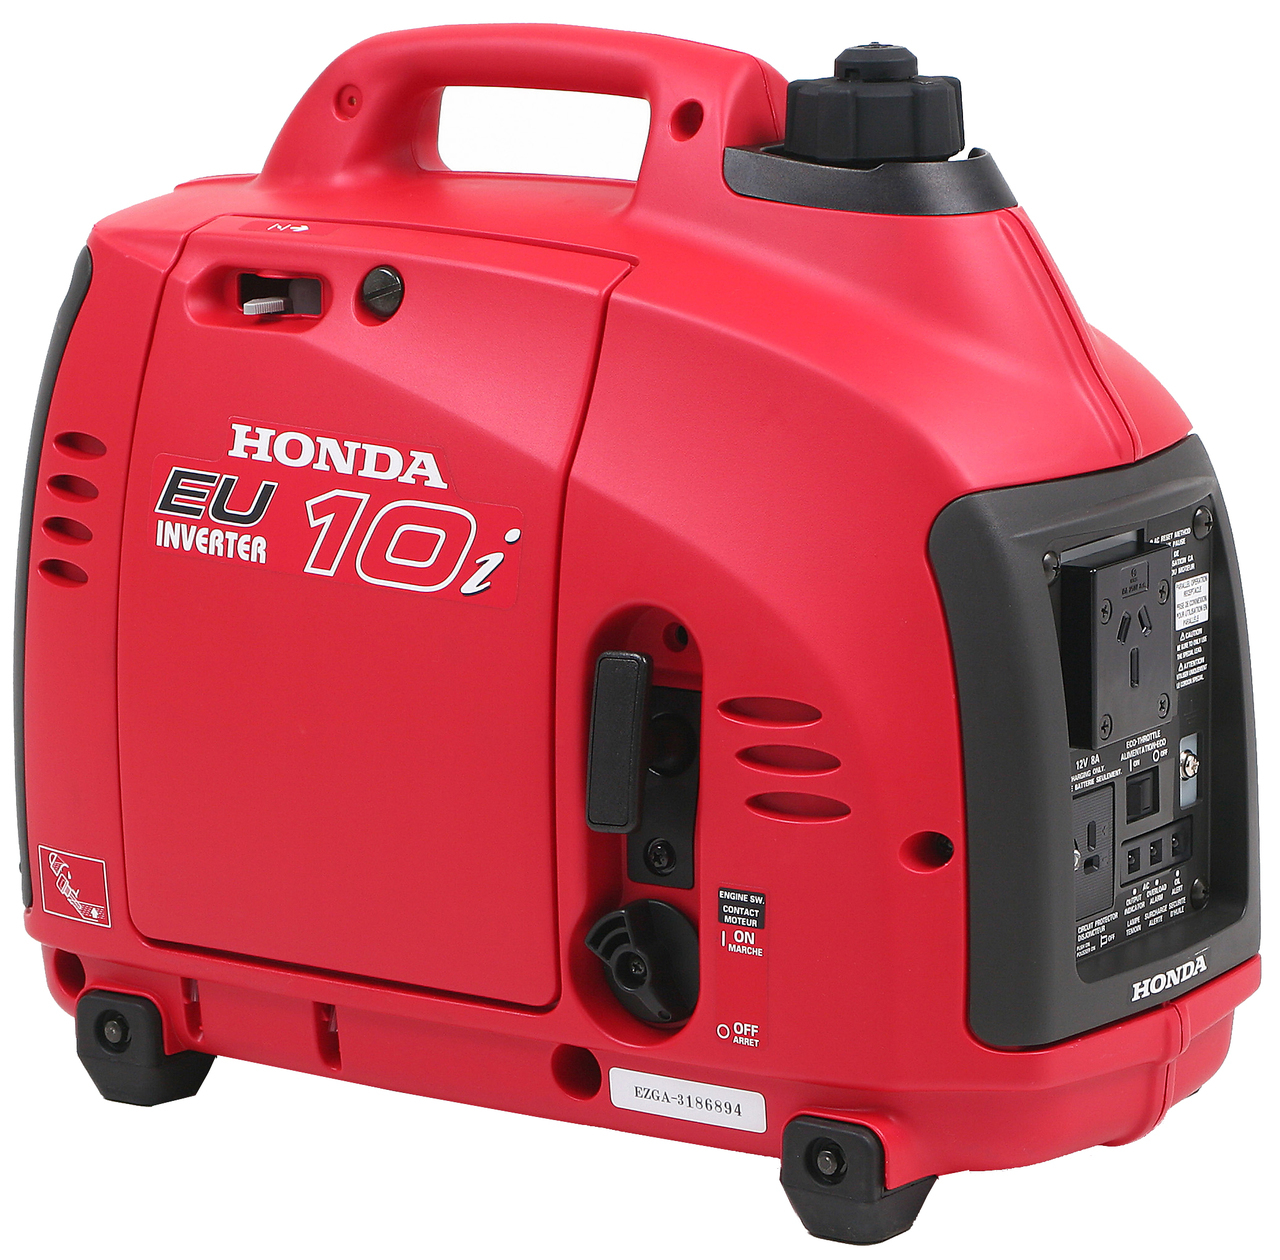 2 kva generator price in bangalore dating 2